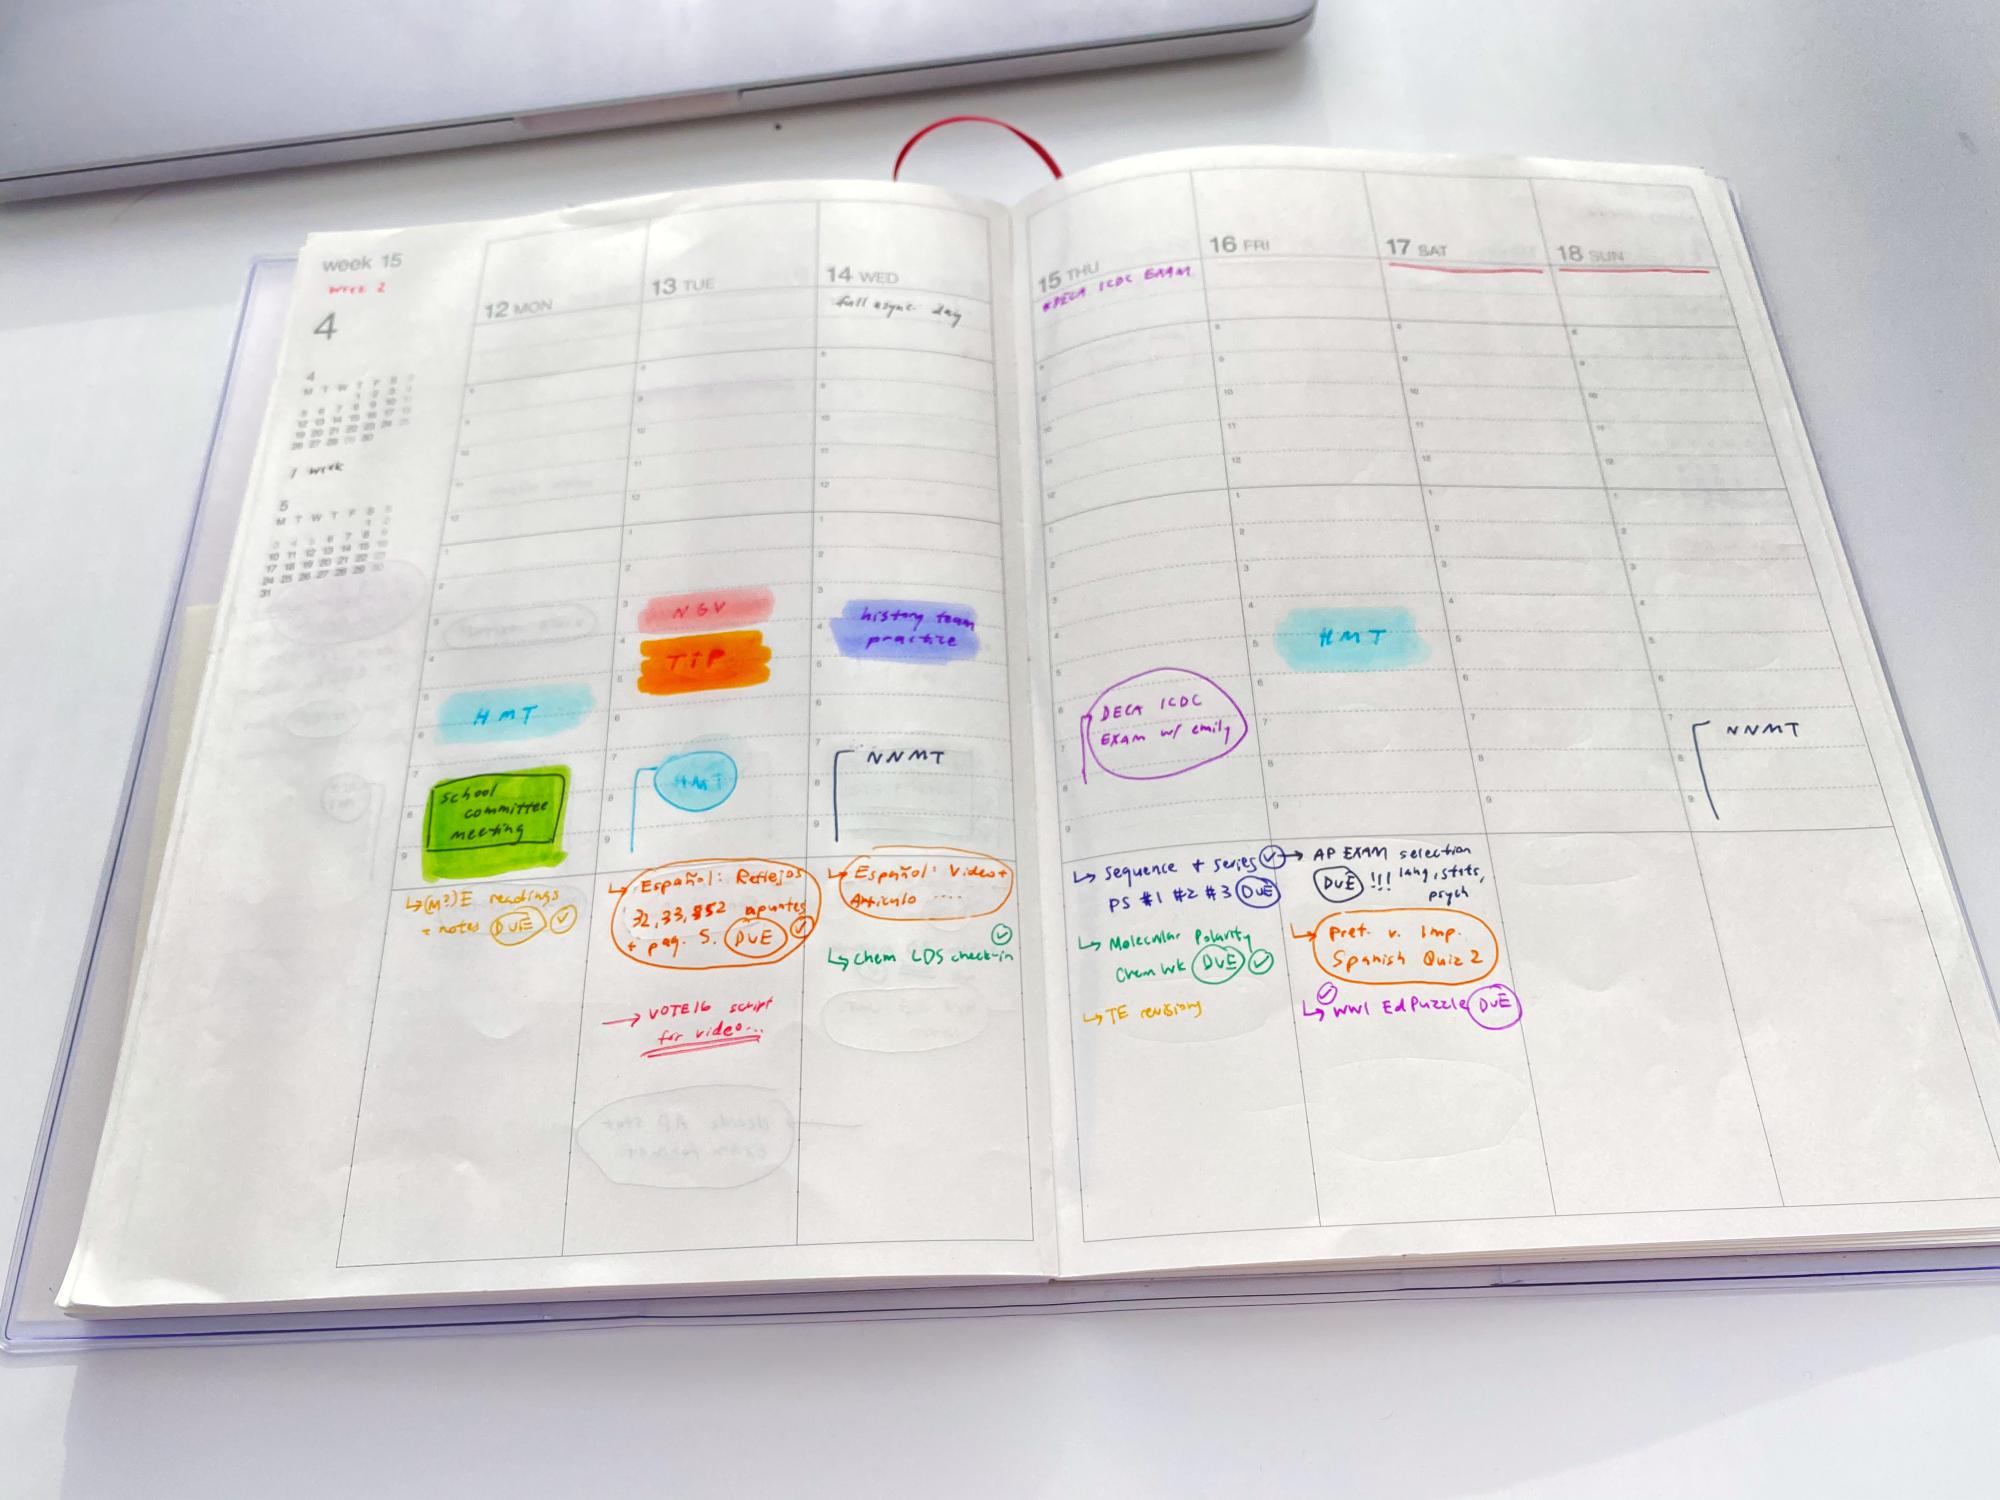 A photo of the author's physical planner. Photo courtesy of Haruka Nabeshima.